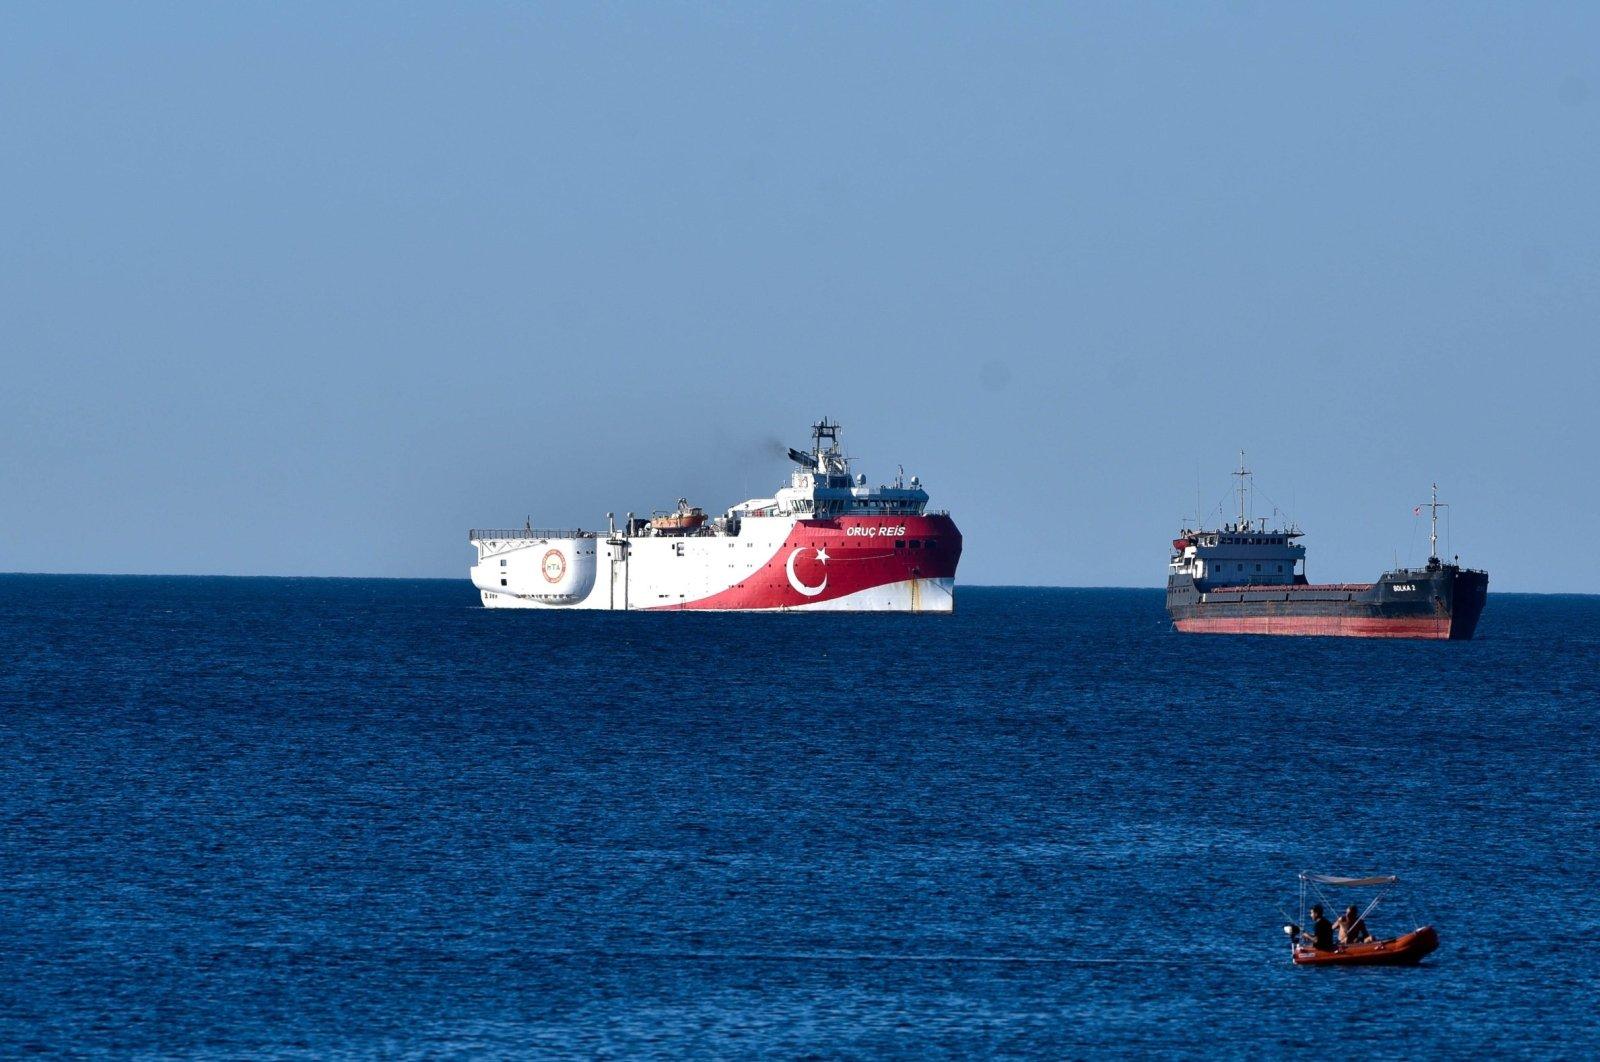 Turkey's seismic exploration vessel Oruç Reis is seen off the shore of Antalya, southwest Turkey, July 23, 2020. (DHA Photo)